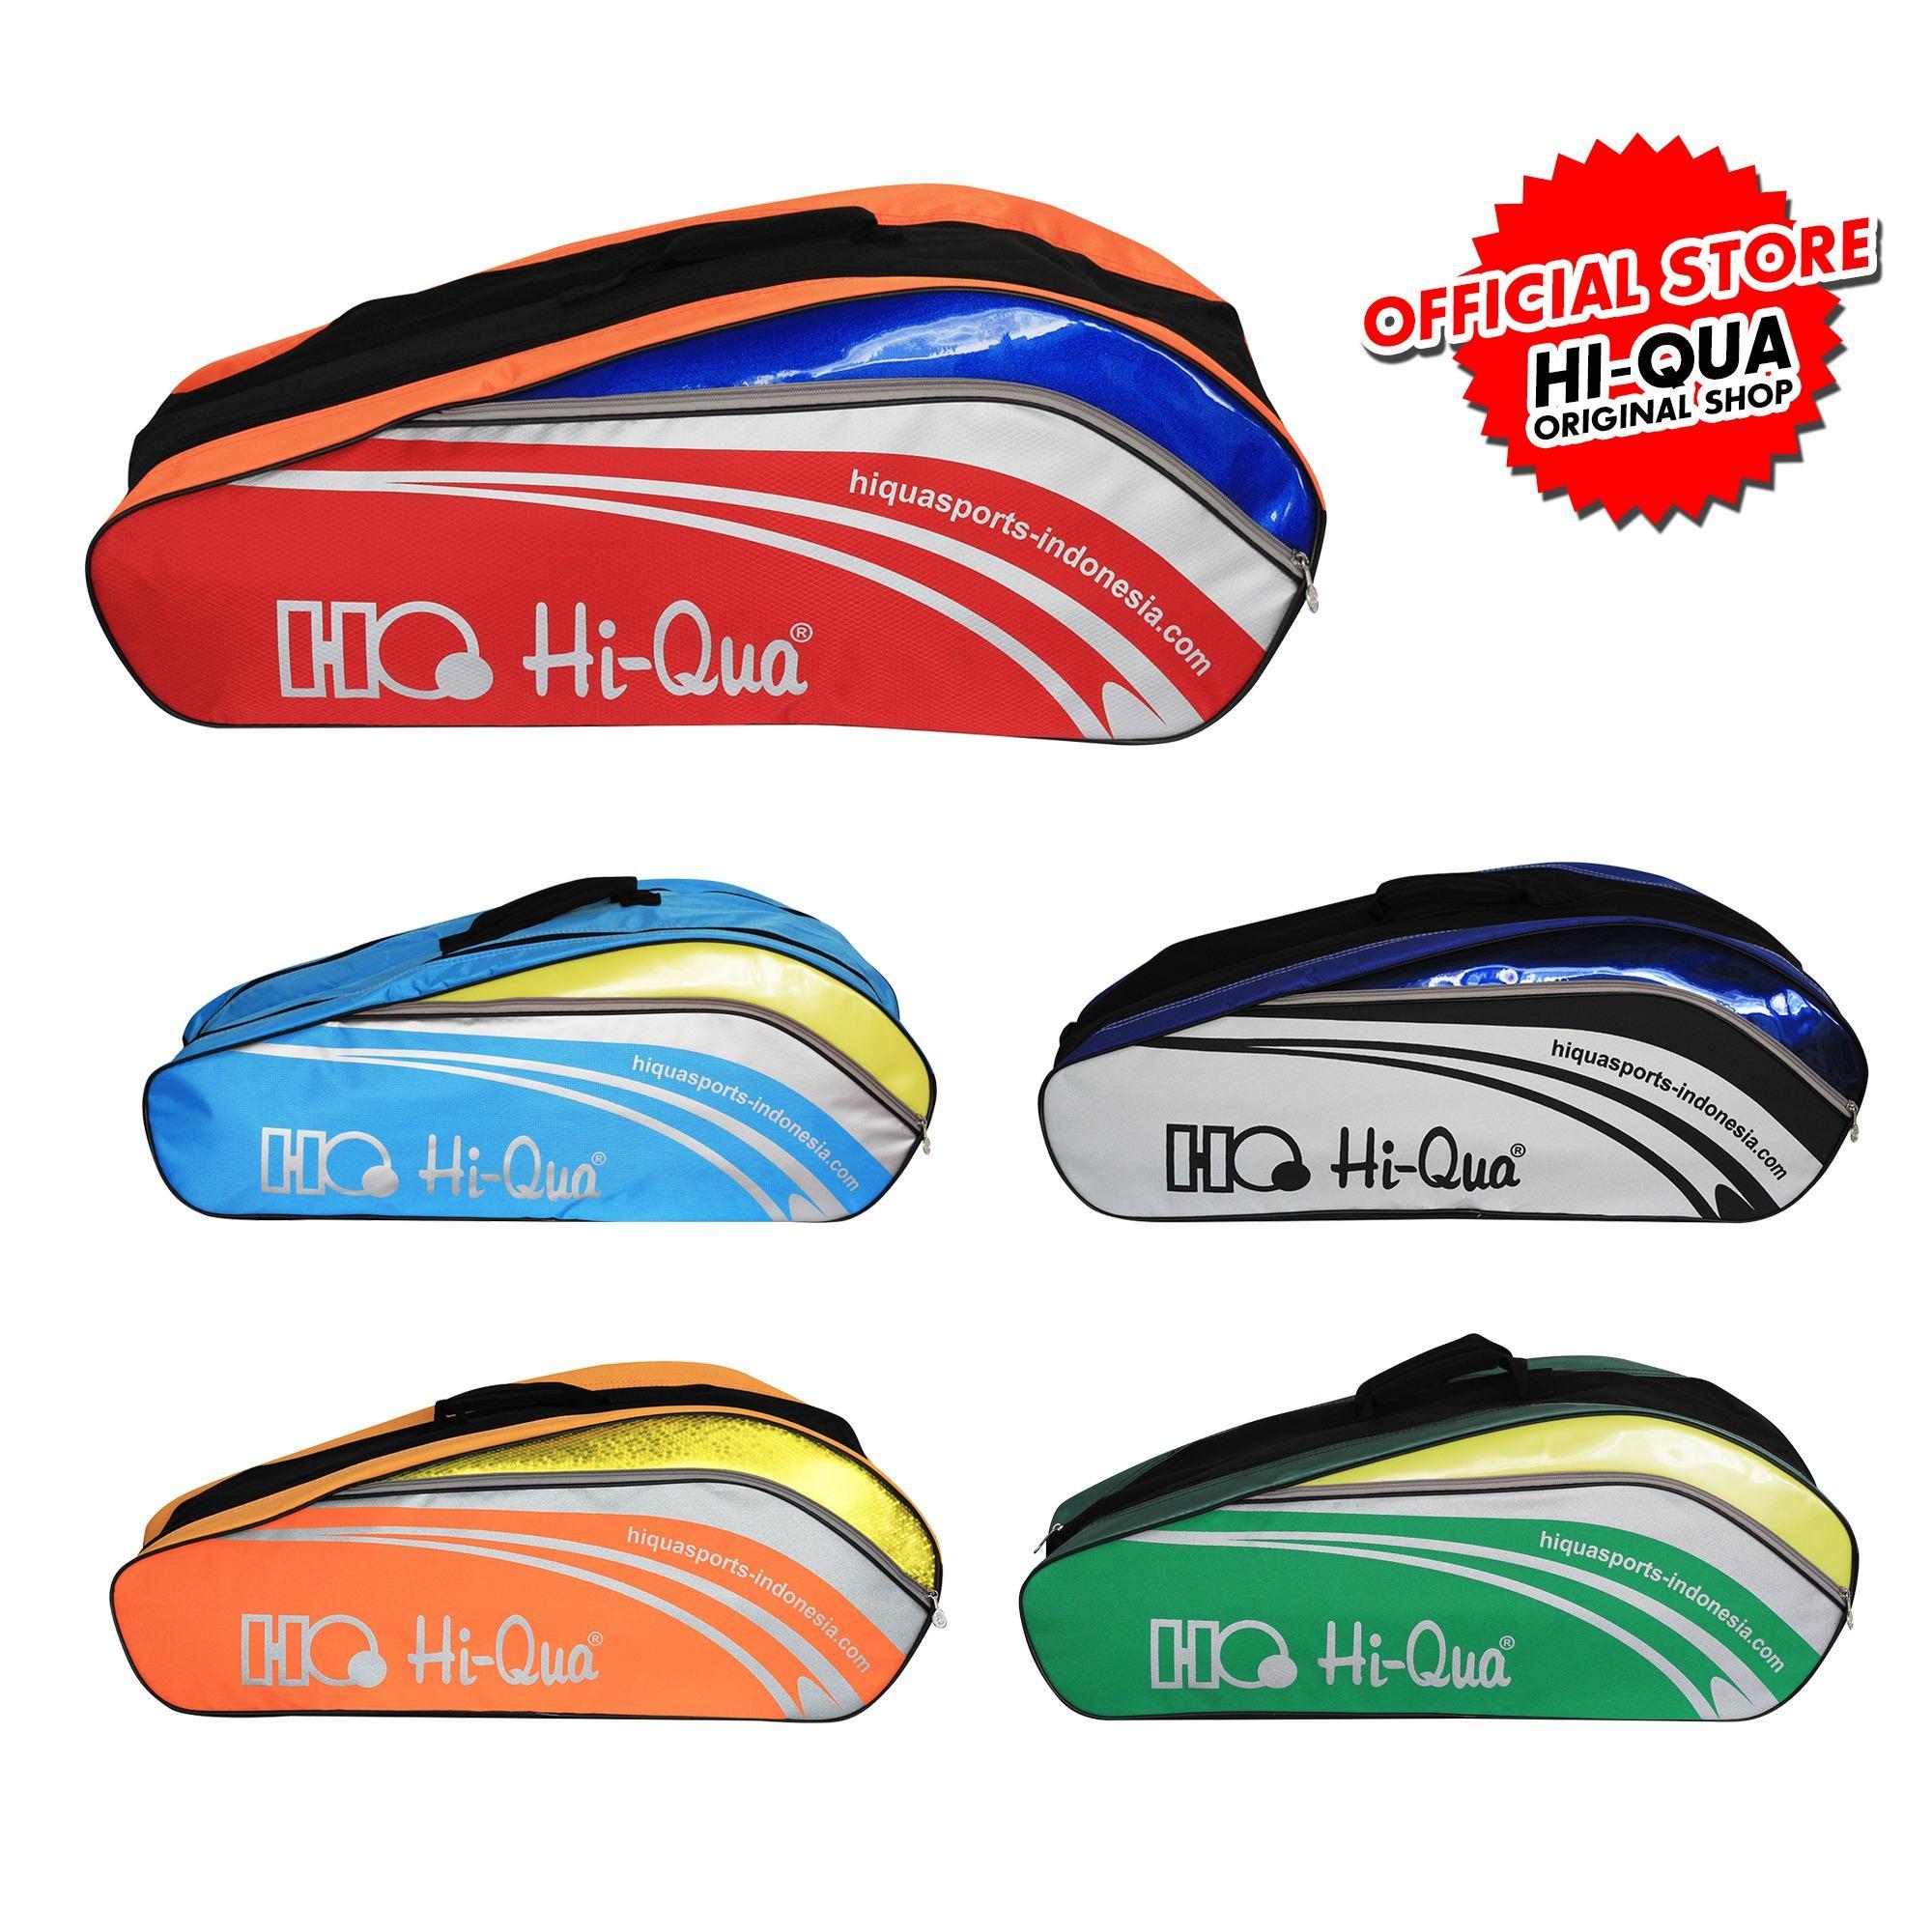 PAKET LIMITED EDITION  Hi-Qua Raket Bulutangkis   Badminton BB Edition 09  Flex  b329cecf28